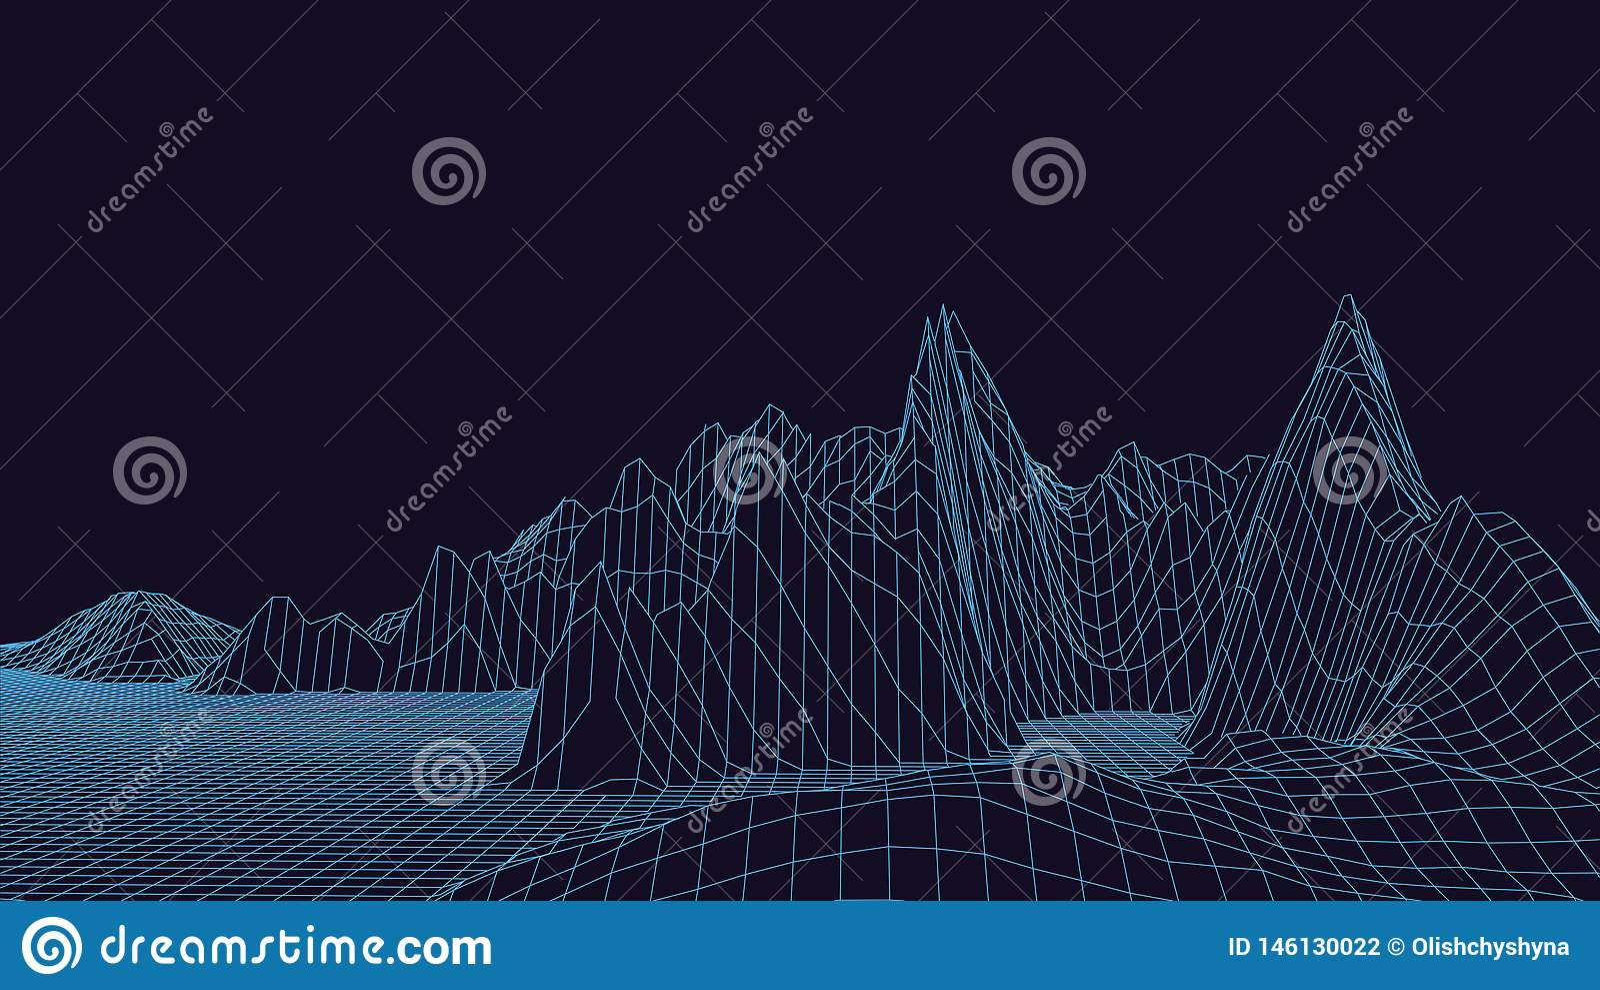 3d technology vector illustration. Abstraction. Landscape design of mountains